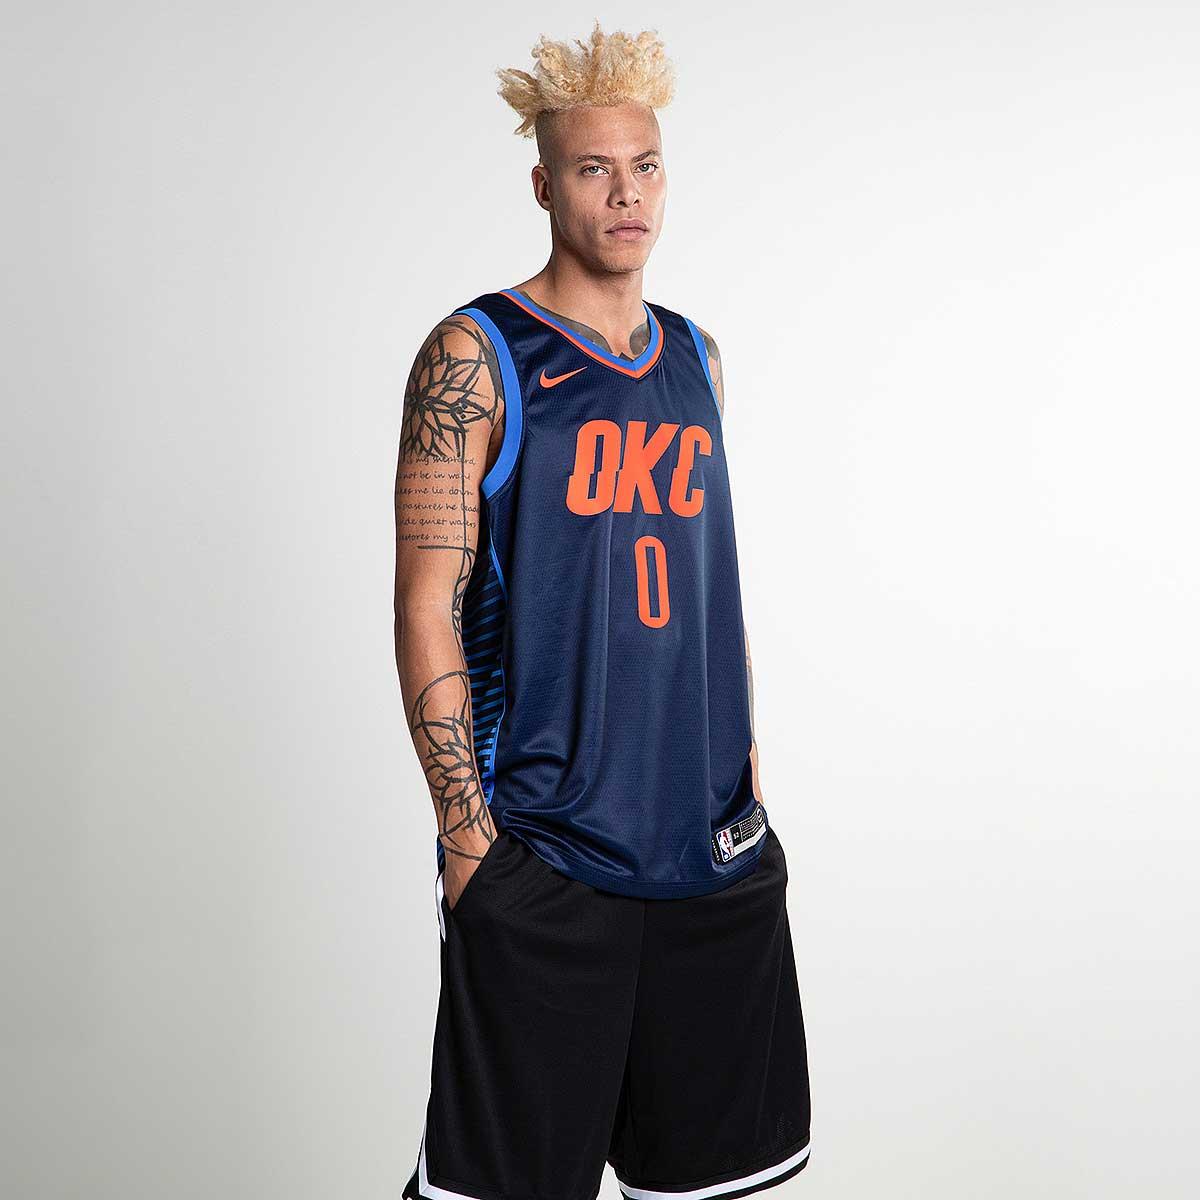 08ed8c87d23 Nike NBA Oklahoma City Thunder Russell Westbrook Statement Edition Swingman  Jersey - NBA Shop OKC Thunder Merchandise - Superfanas.lt